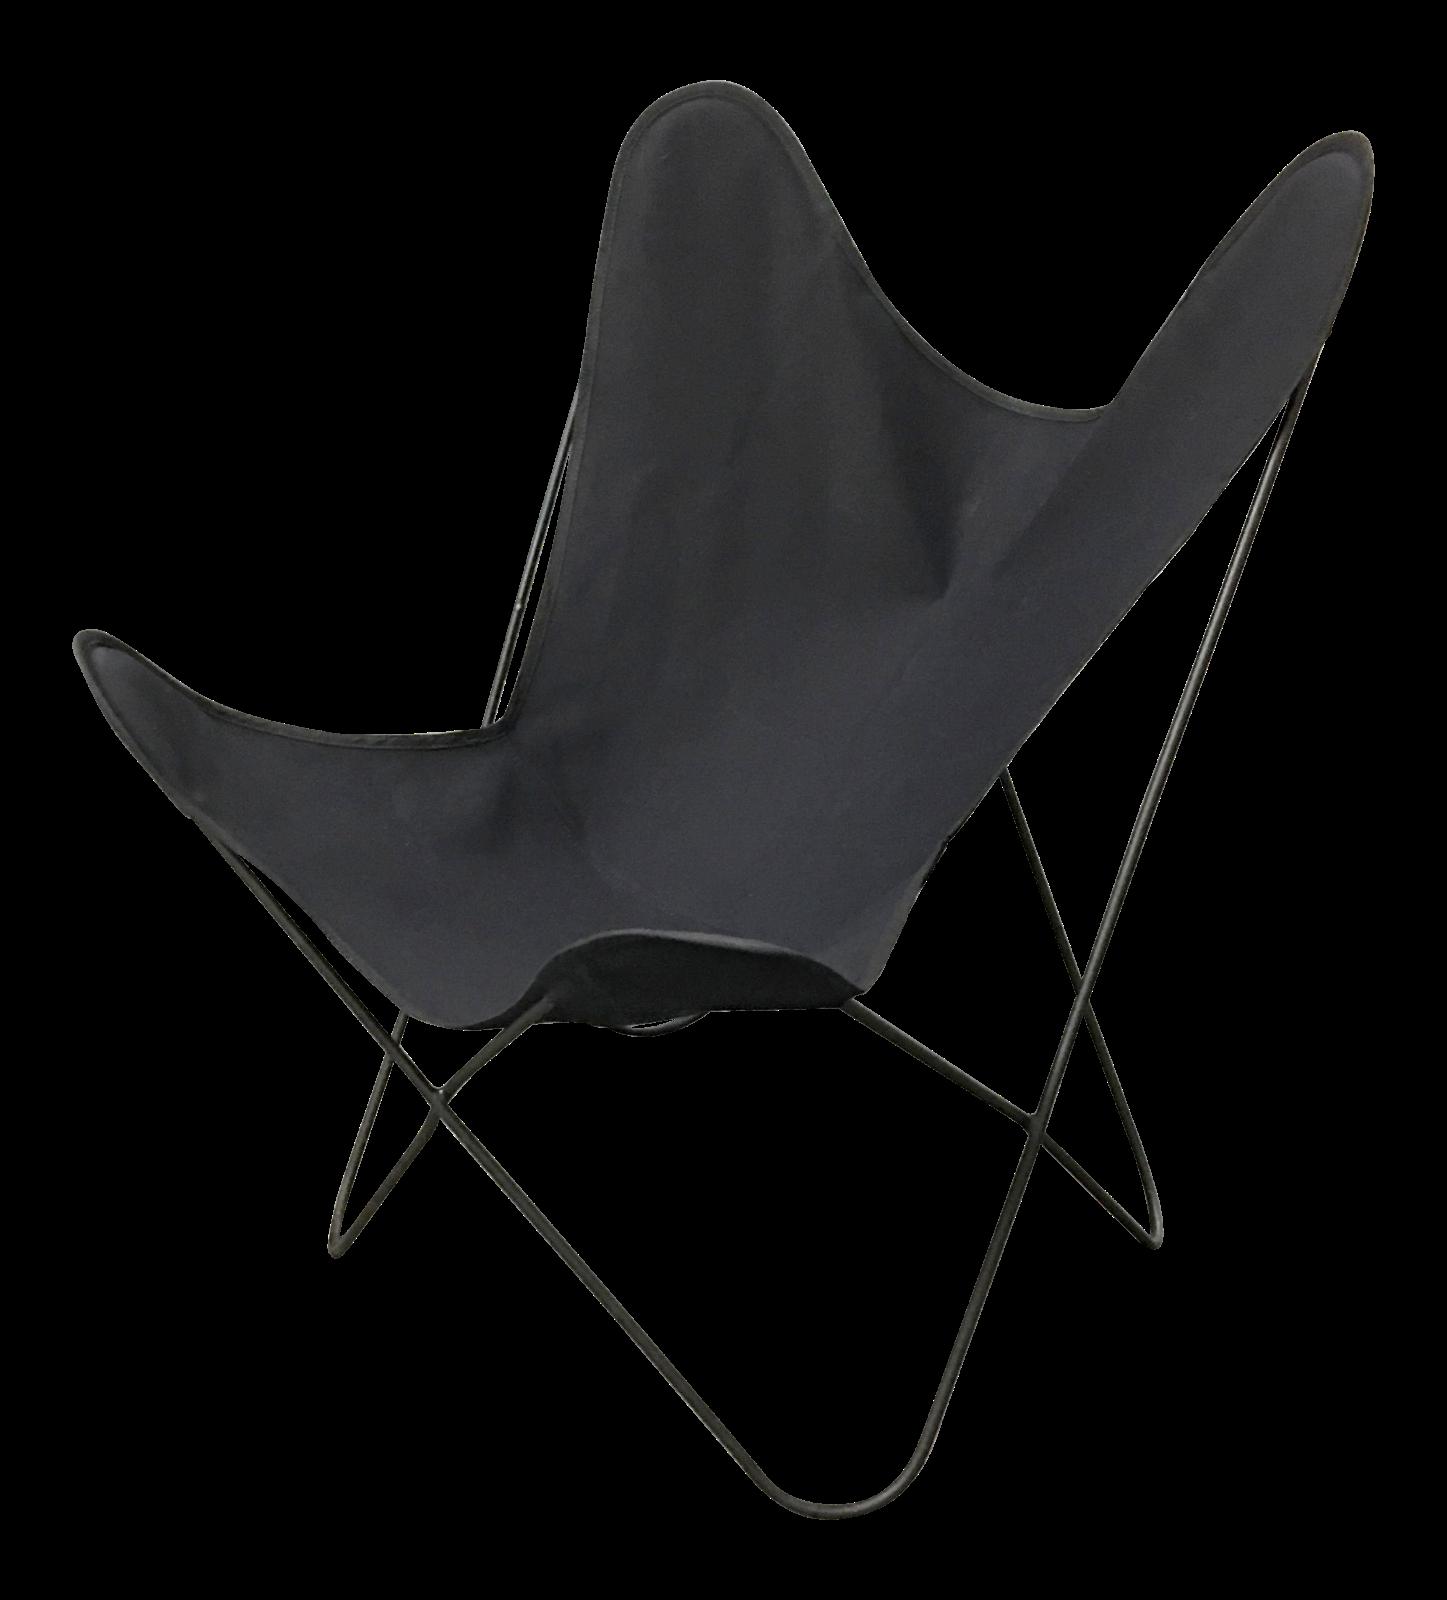 Jorge Ferrari Hardoy Mid Century Butterfly Chair